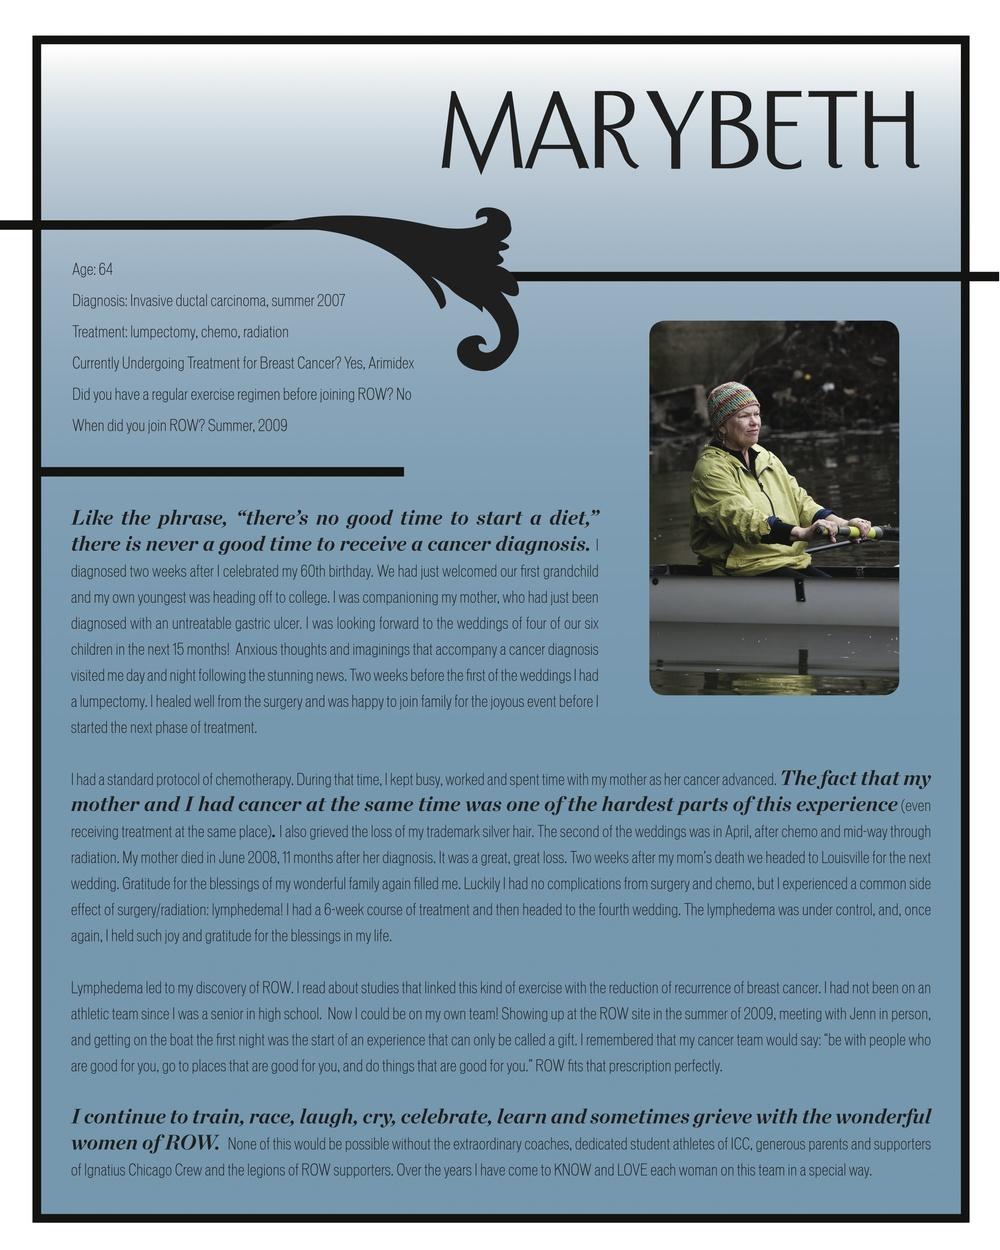 marybeth.jpg